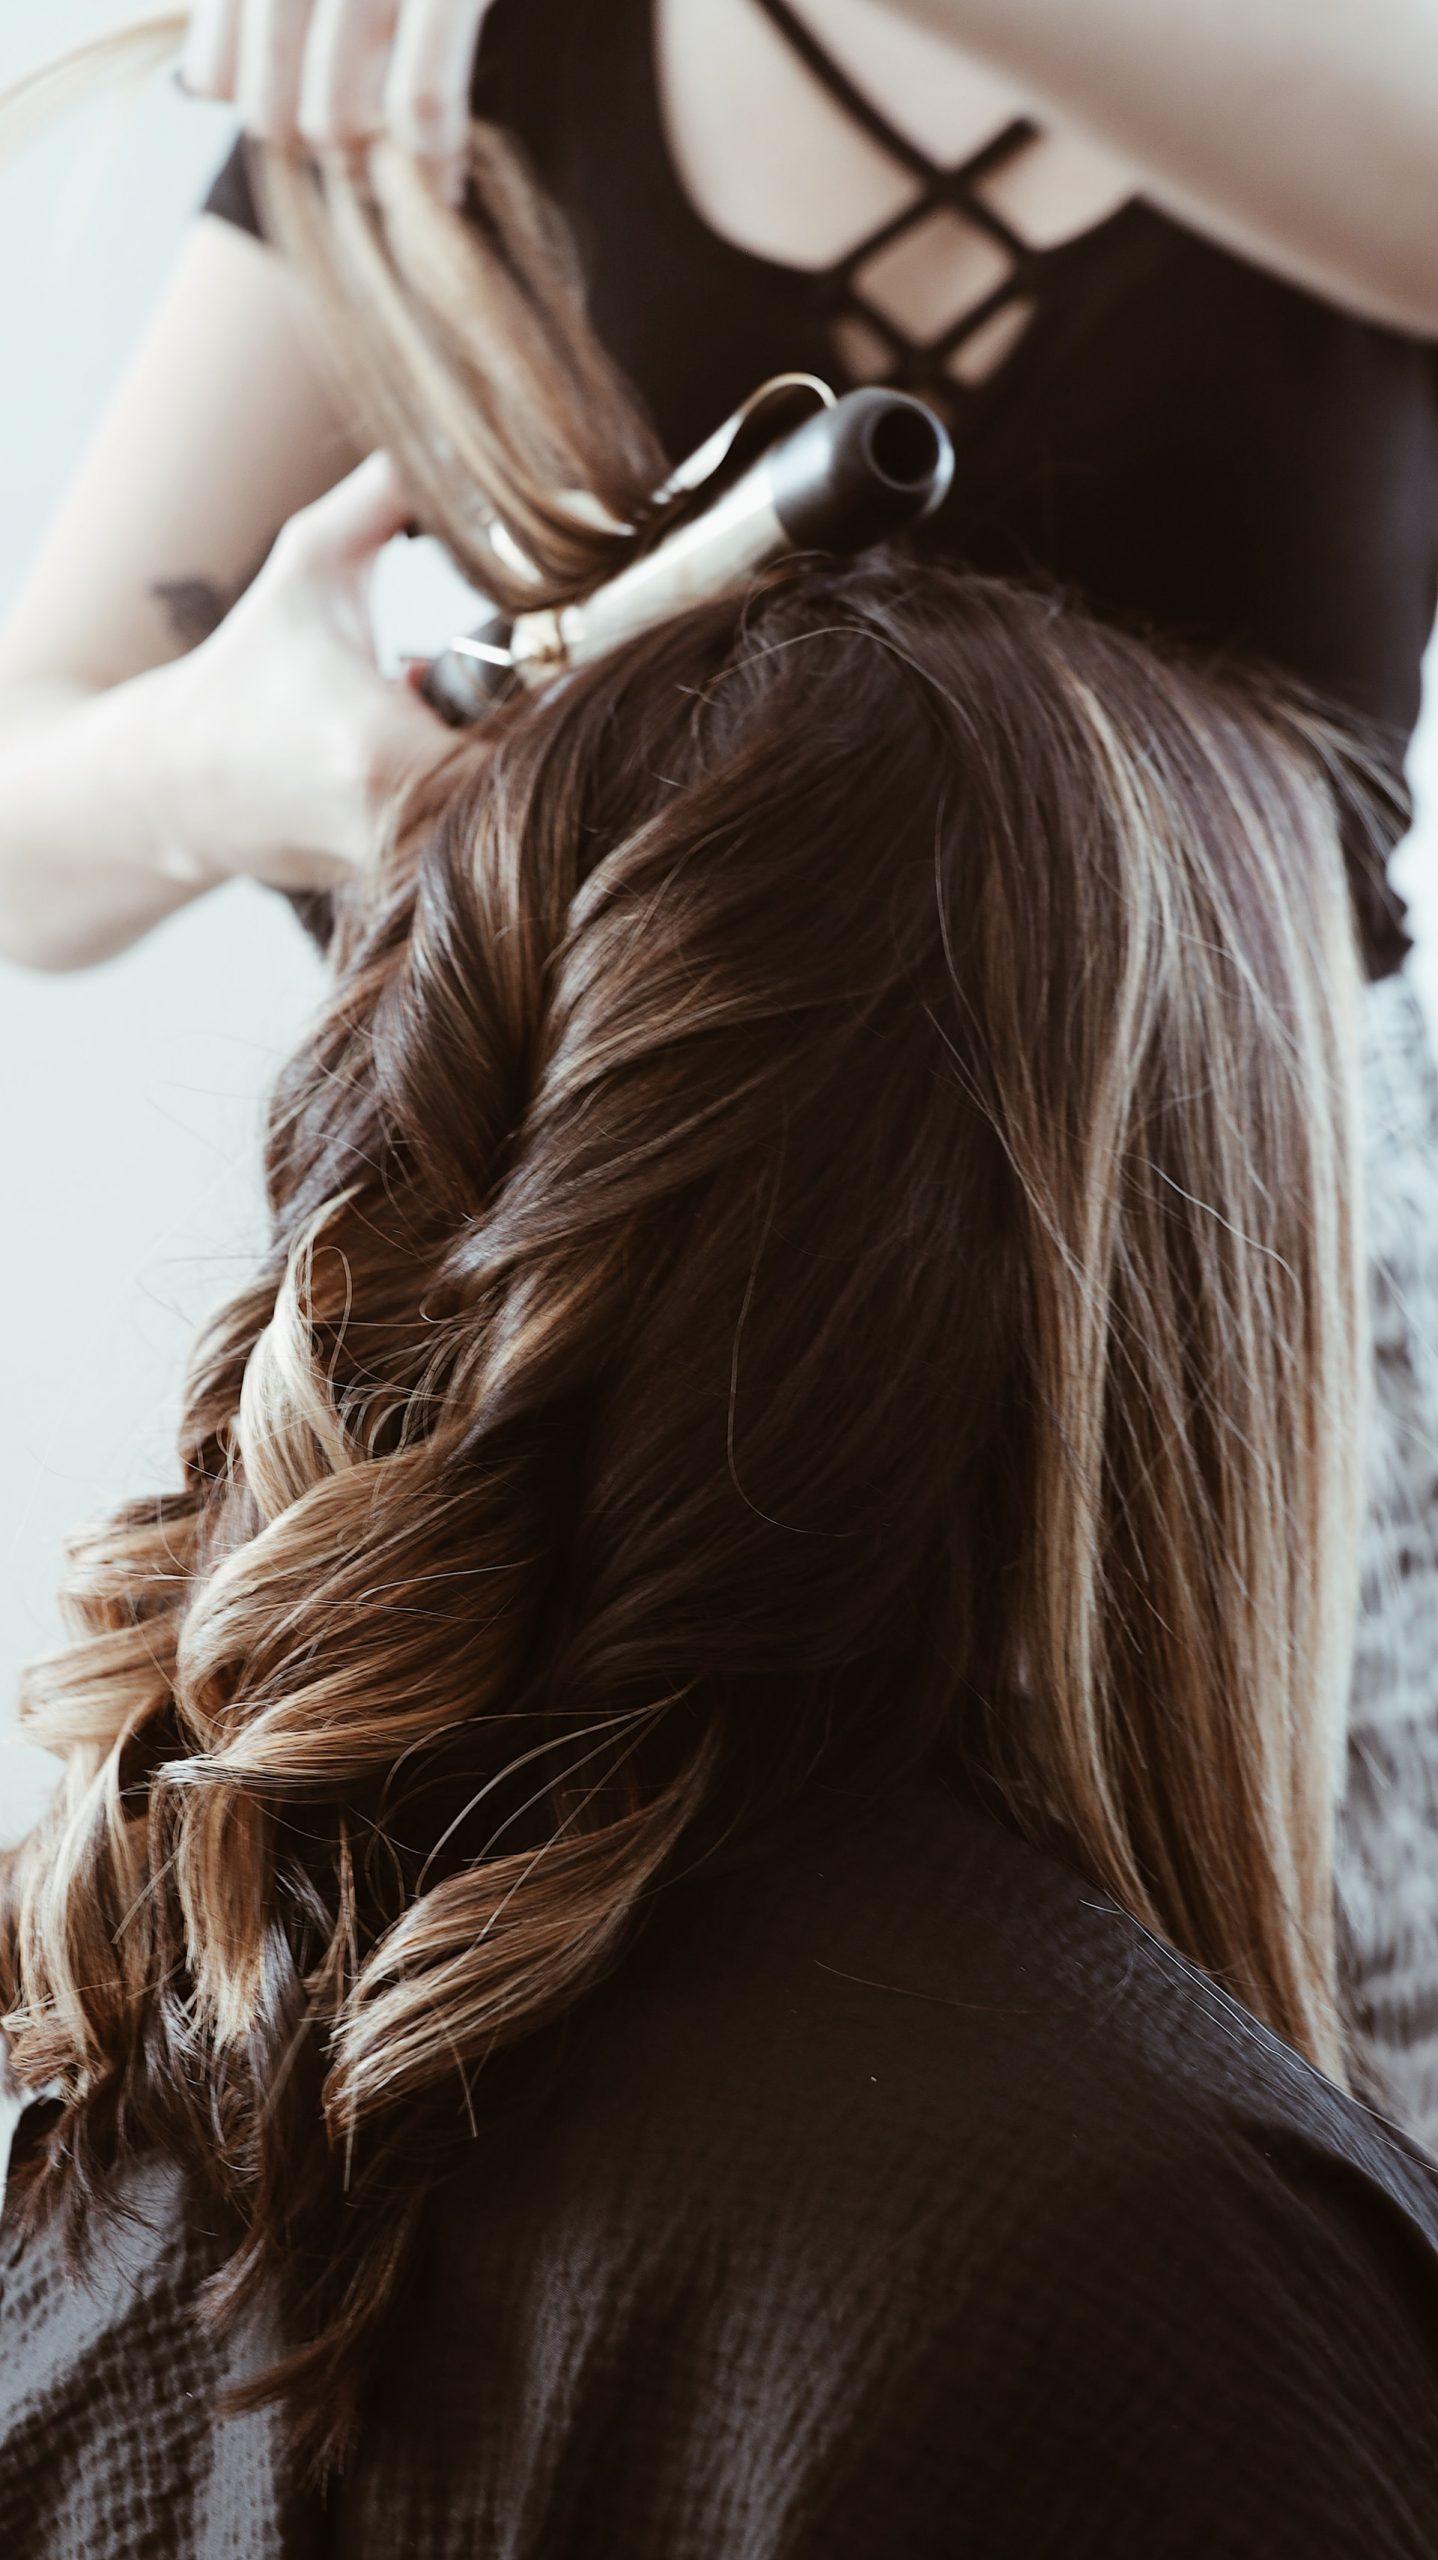 Parturi-kampaamo hiusten kiharrus